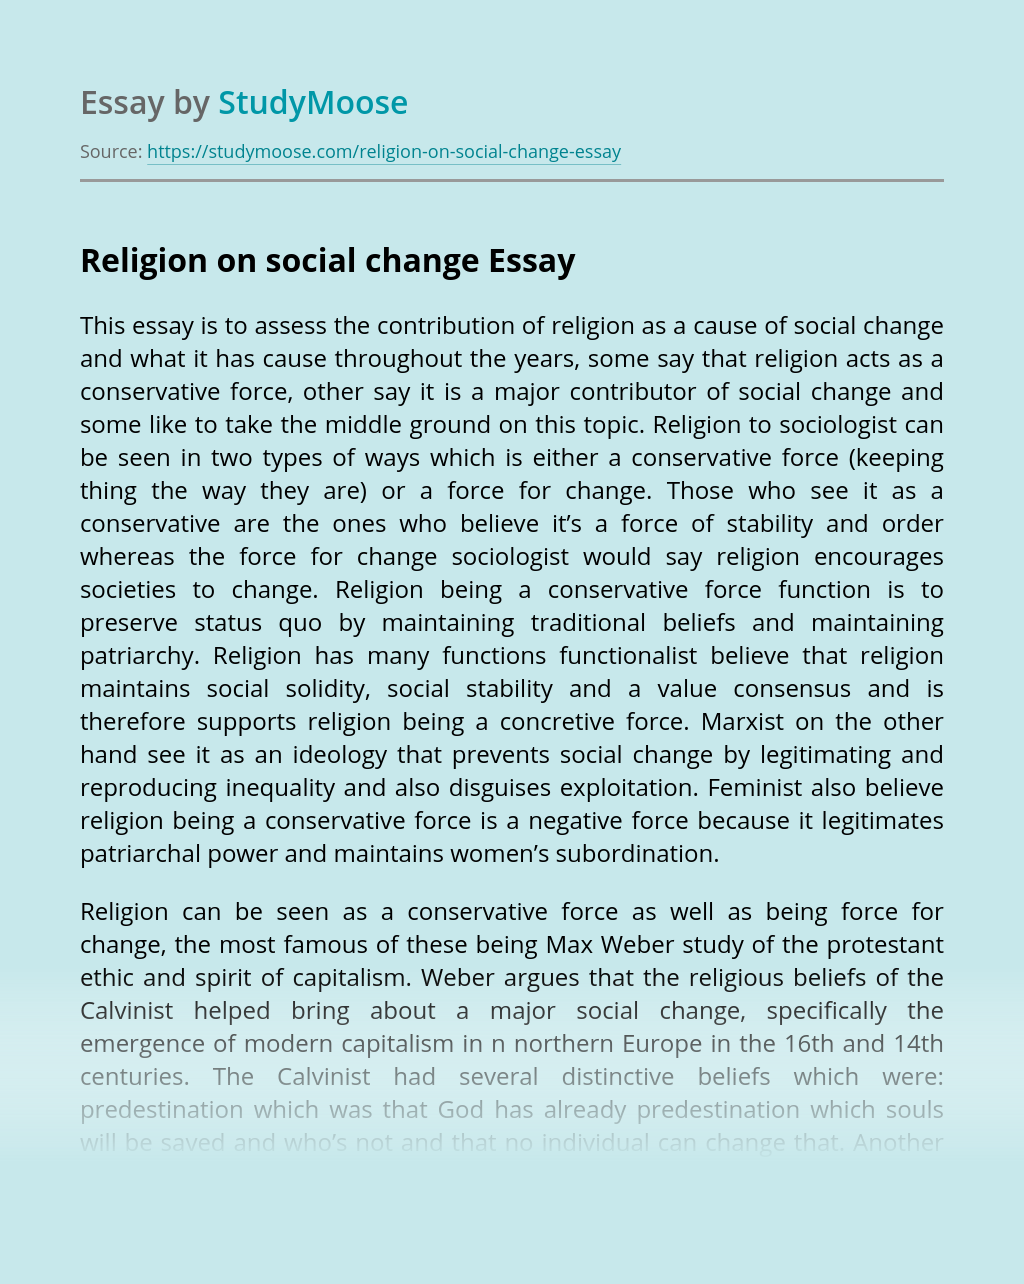 Religion on social change